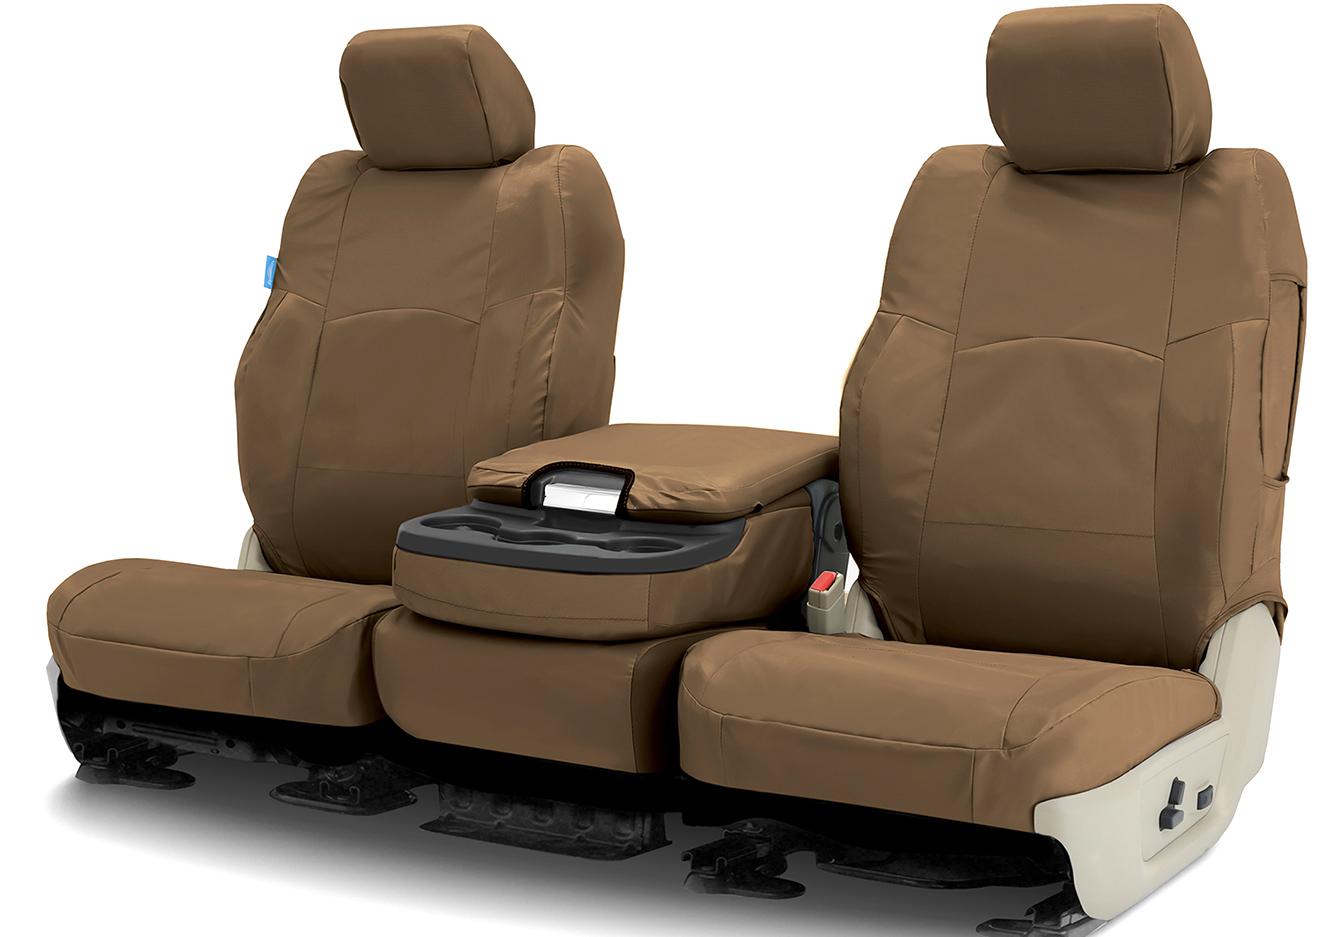 Top 10 Waterproof Car Seat Covers